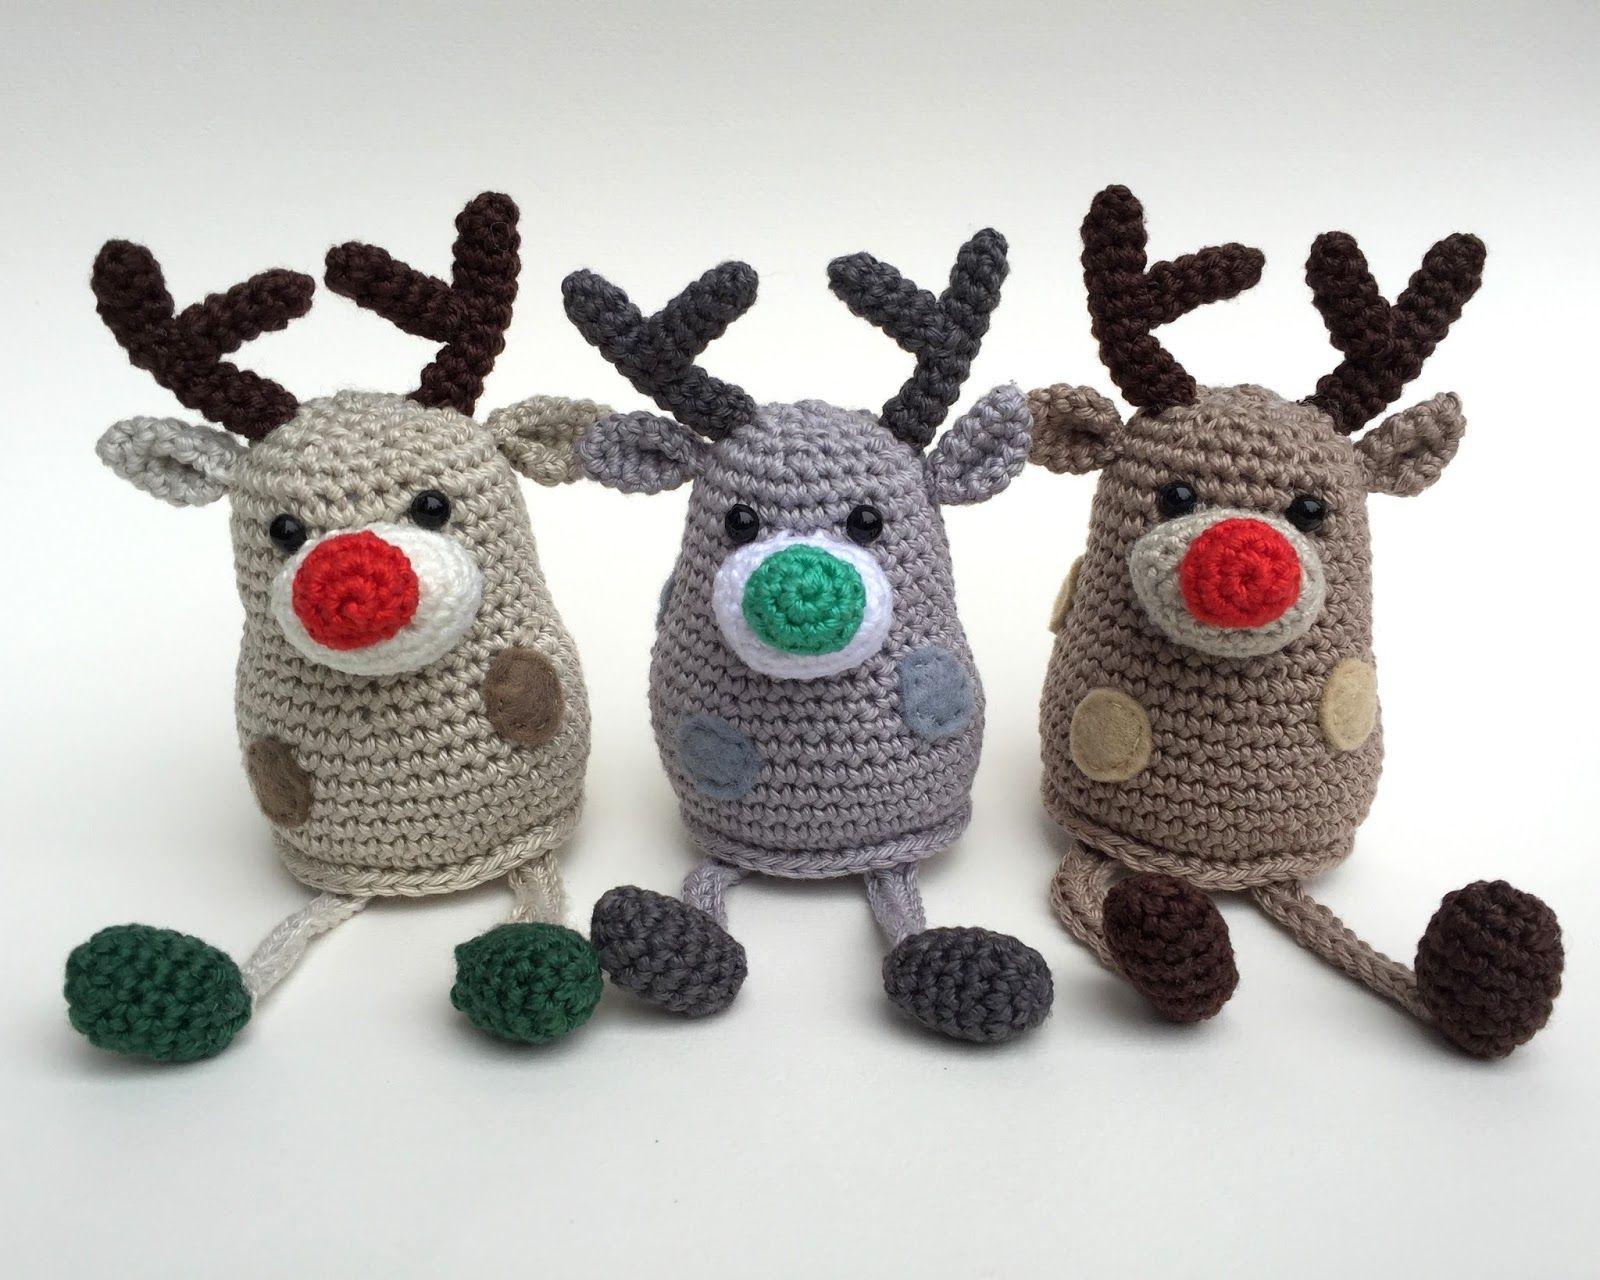 Amigurumi Reindeer Free Pattern : Amigurumi little reindeer free pattern amigurumi free patterns